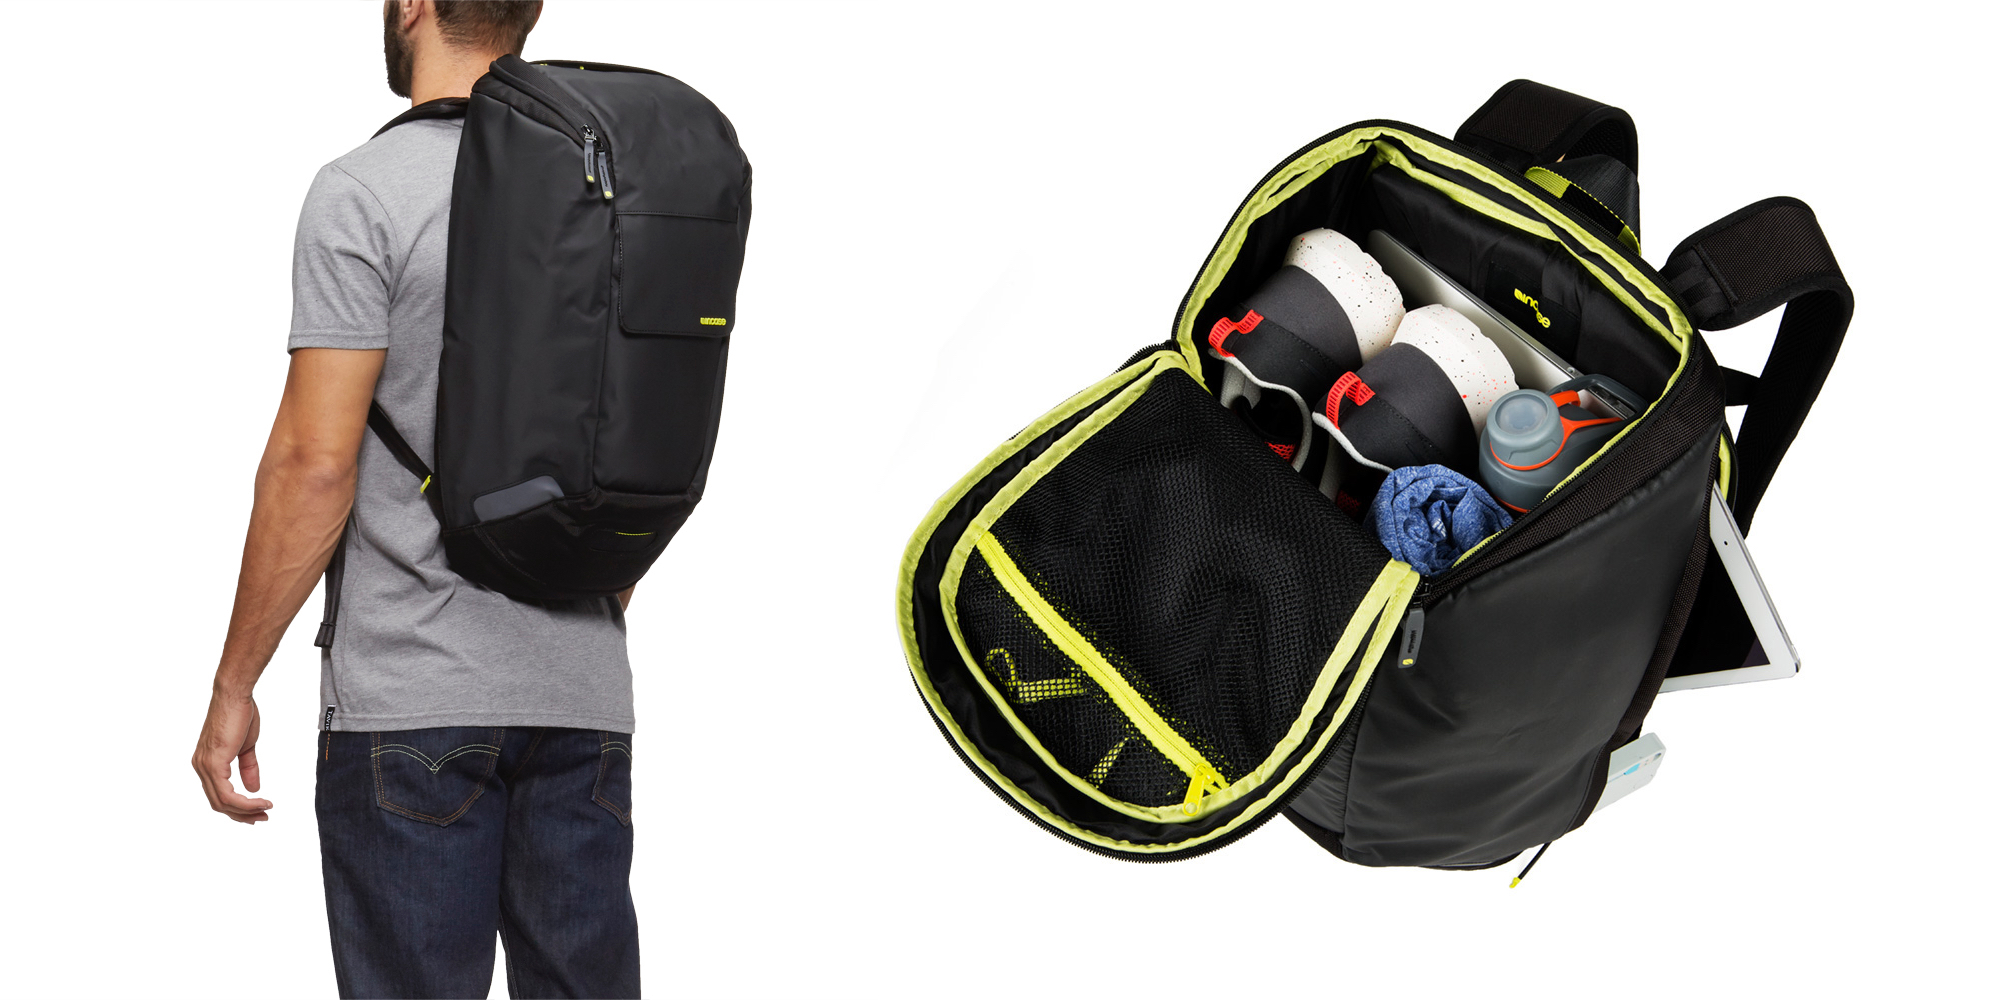 Upgrade your travel setup w/ Incase's Range MacBook Backpack at $60 (Reg. up to $150)